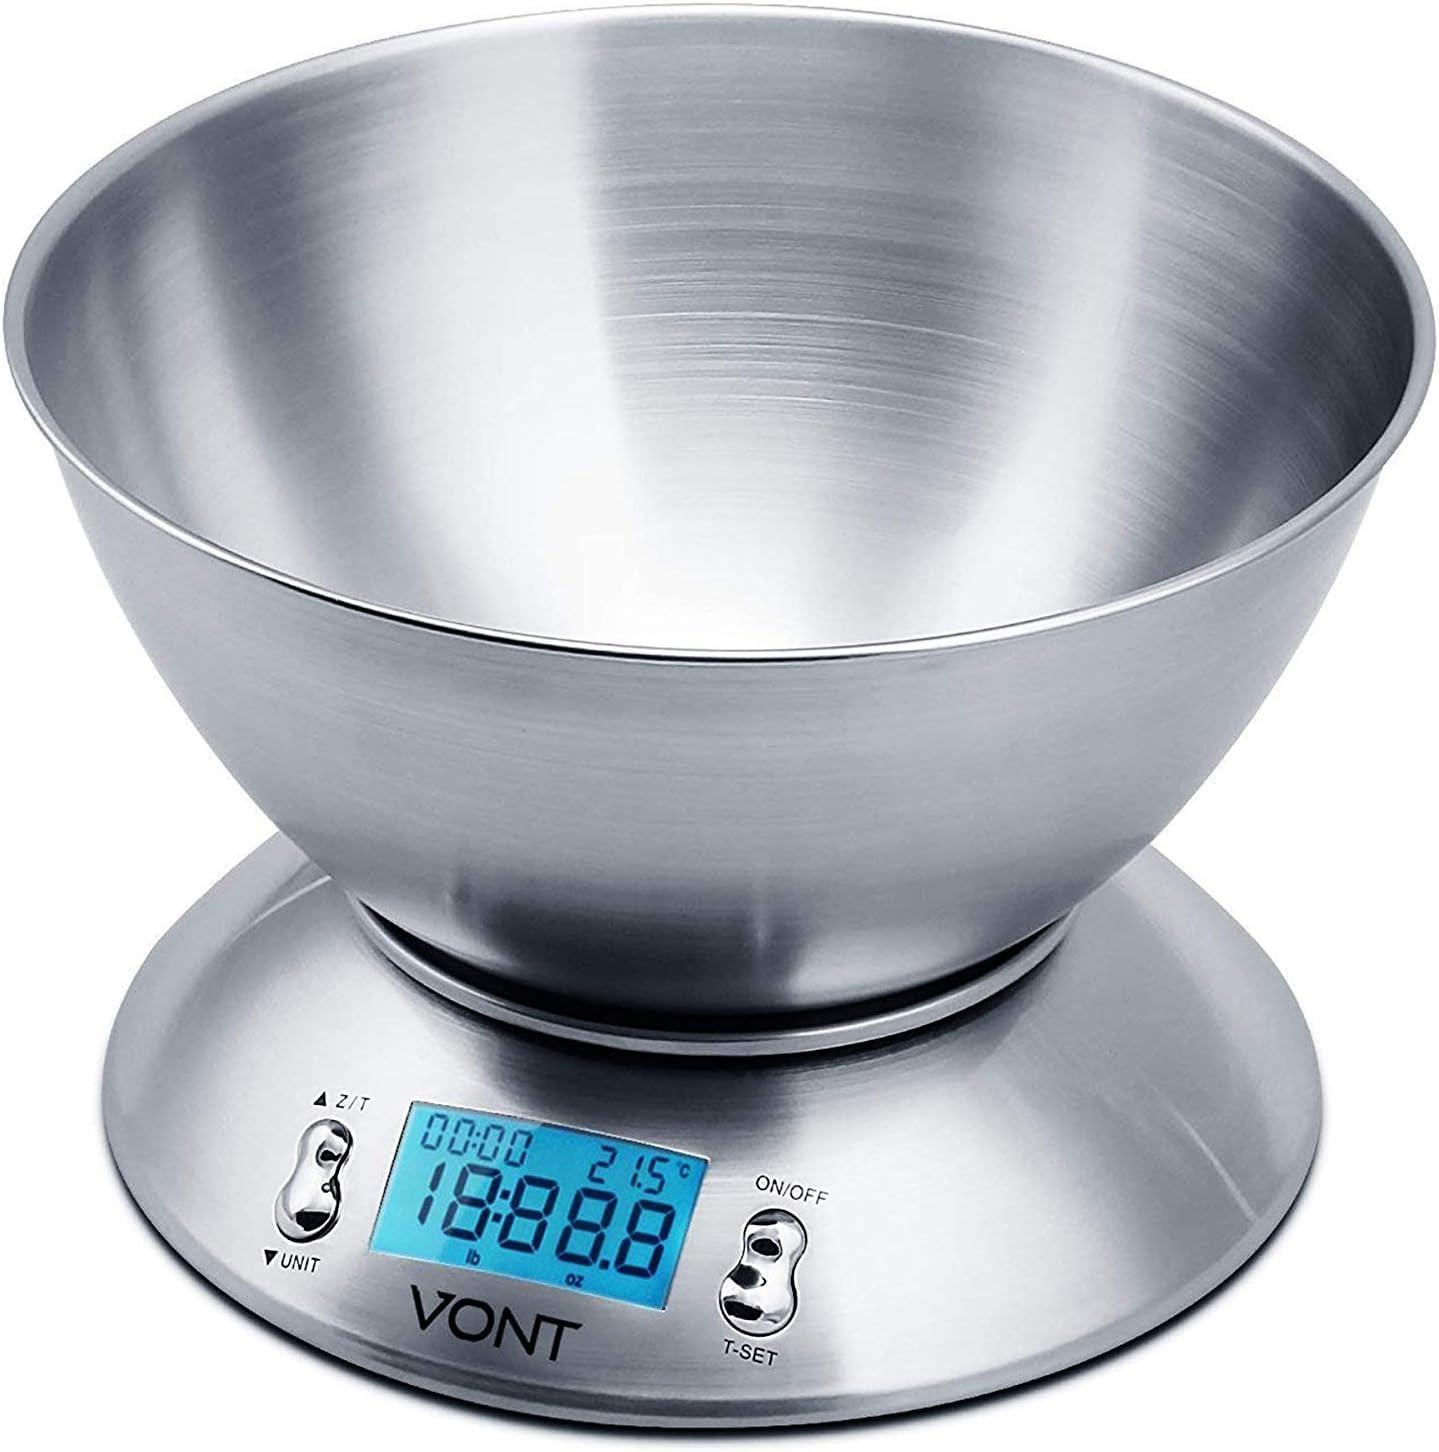 Vont Digital Kitchen Scale / Food Scale, Detachable Bowl Design, Gorgeous Stainless Steel Design with Alarm Timer & Temperature Sensor